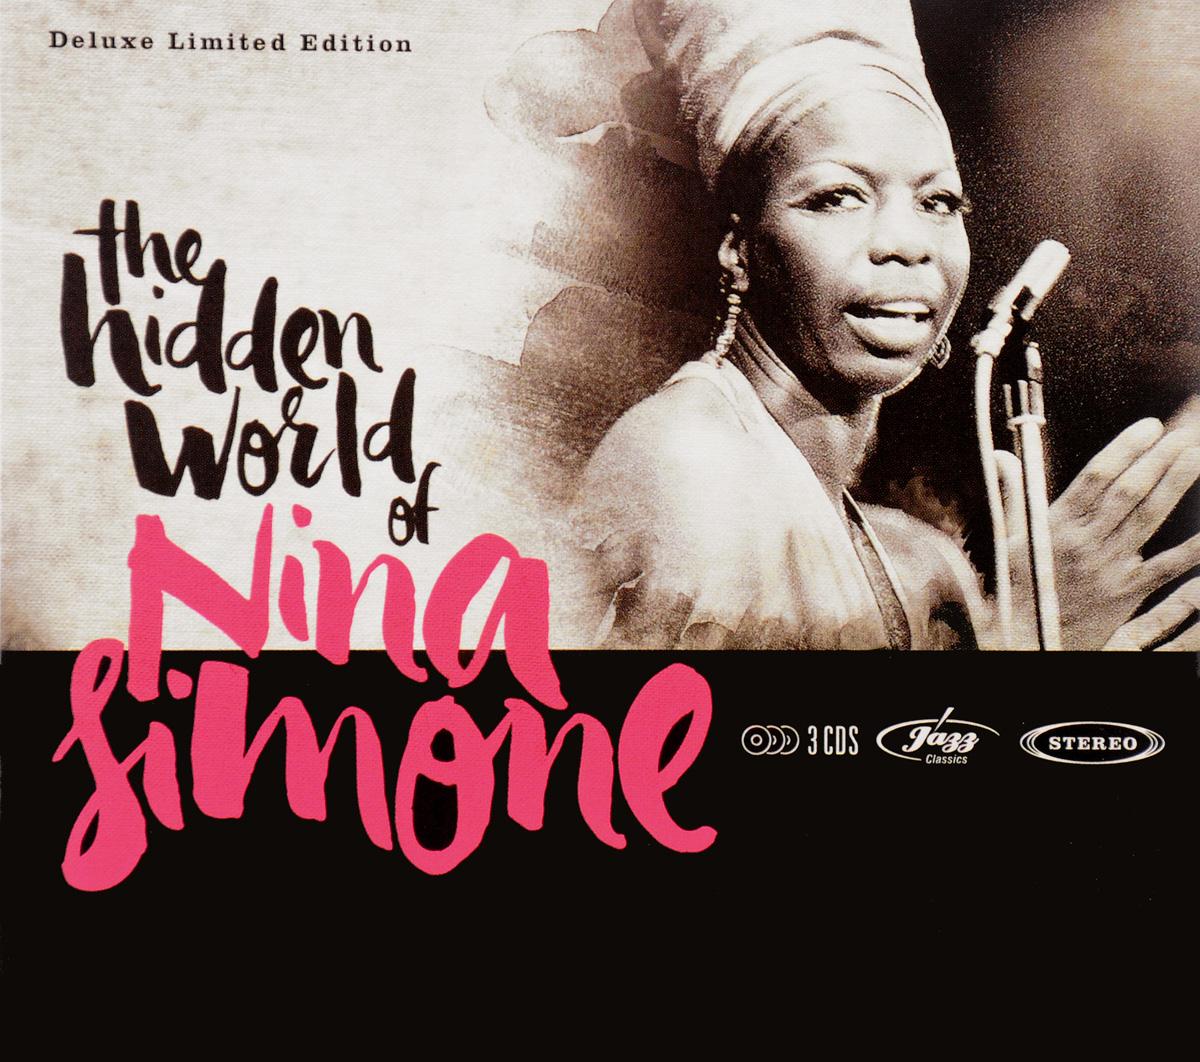 Нина Симон The Hidden World Of Nina Simone. Deluxe Limited Edition (3 CD) nina rae springfields the power of hope